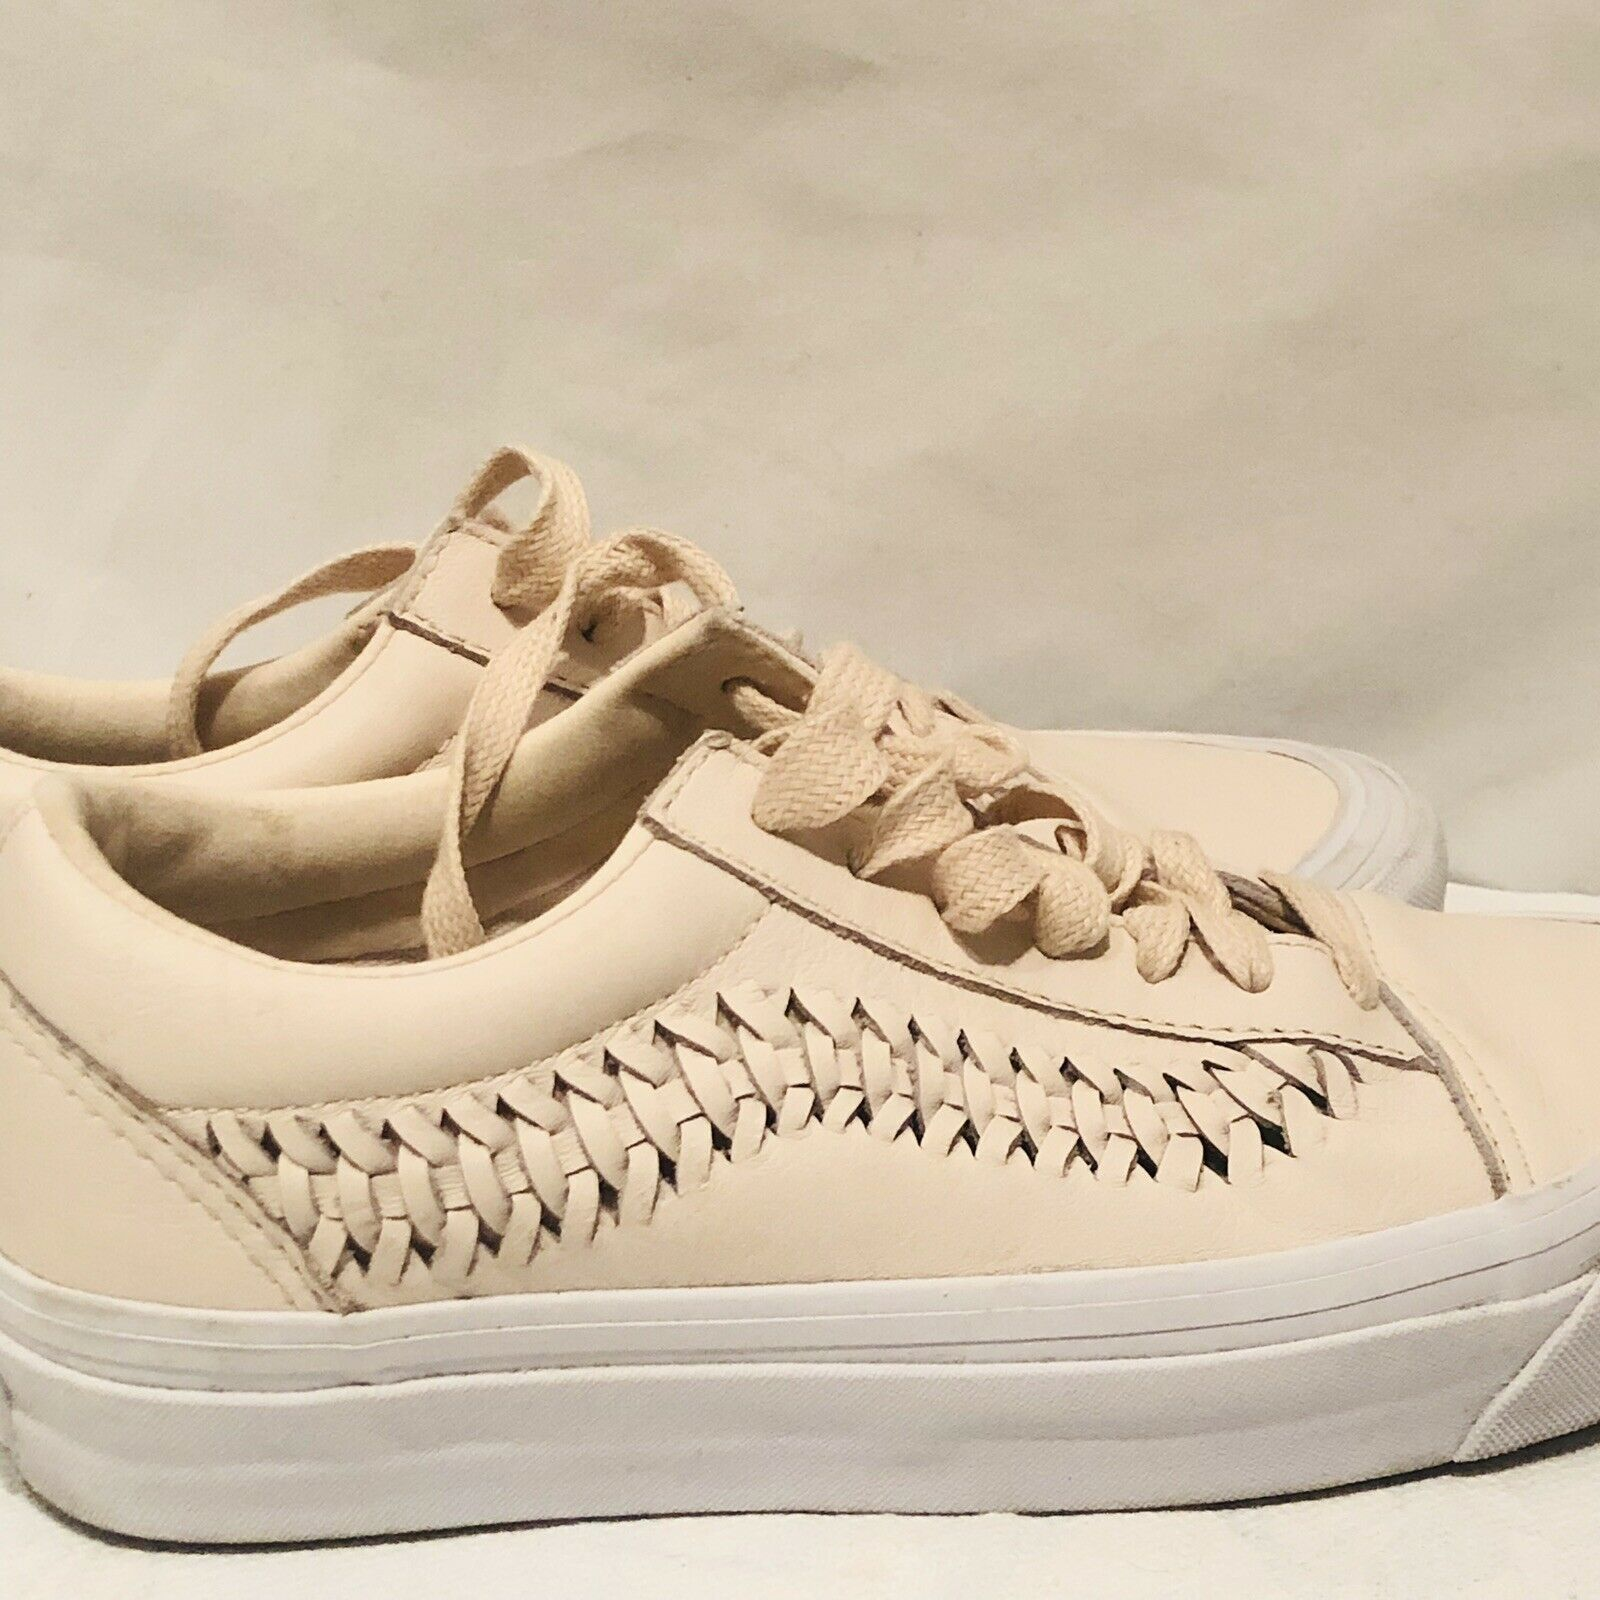 Vans Womens Lace up Shoes Sneakers Size 6 Herringbone